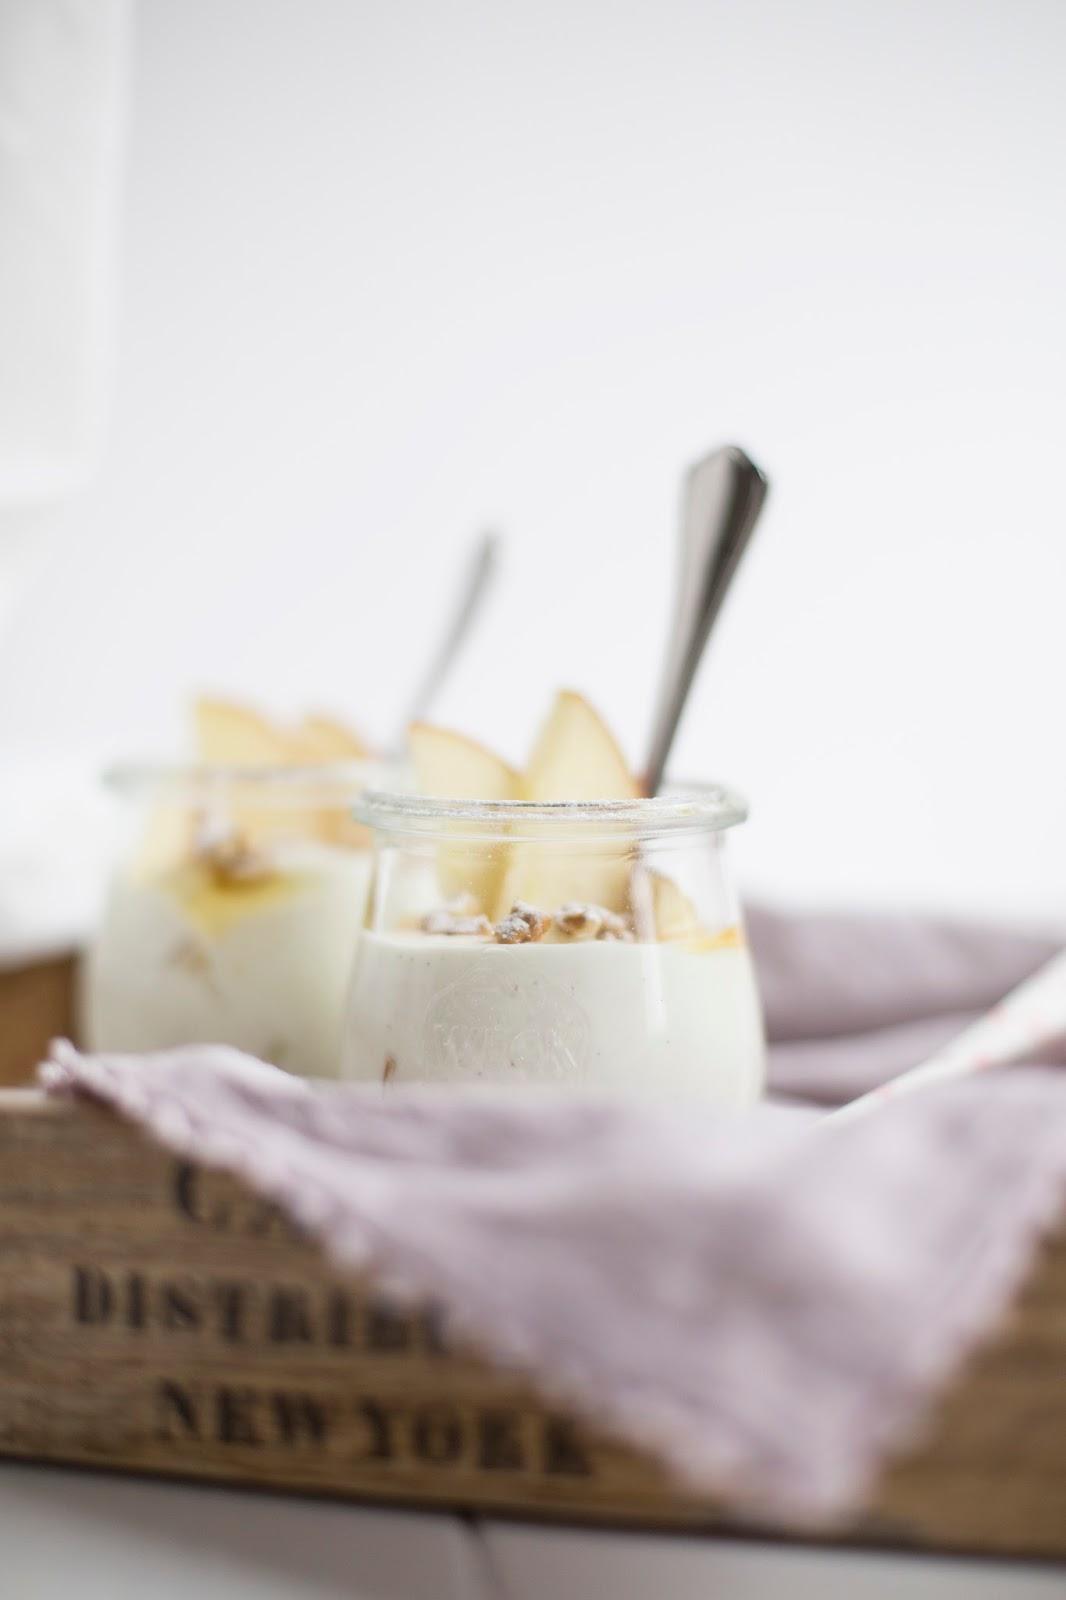 Frühstück ans Bett Joghurt mit Äpfel und Nüsse